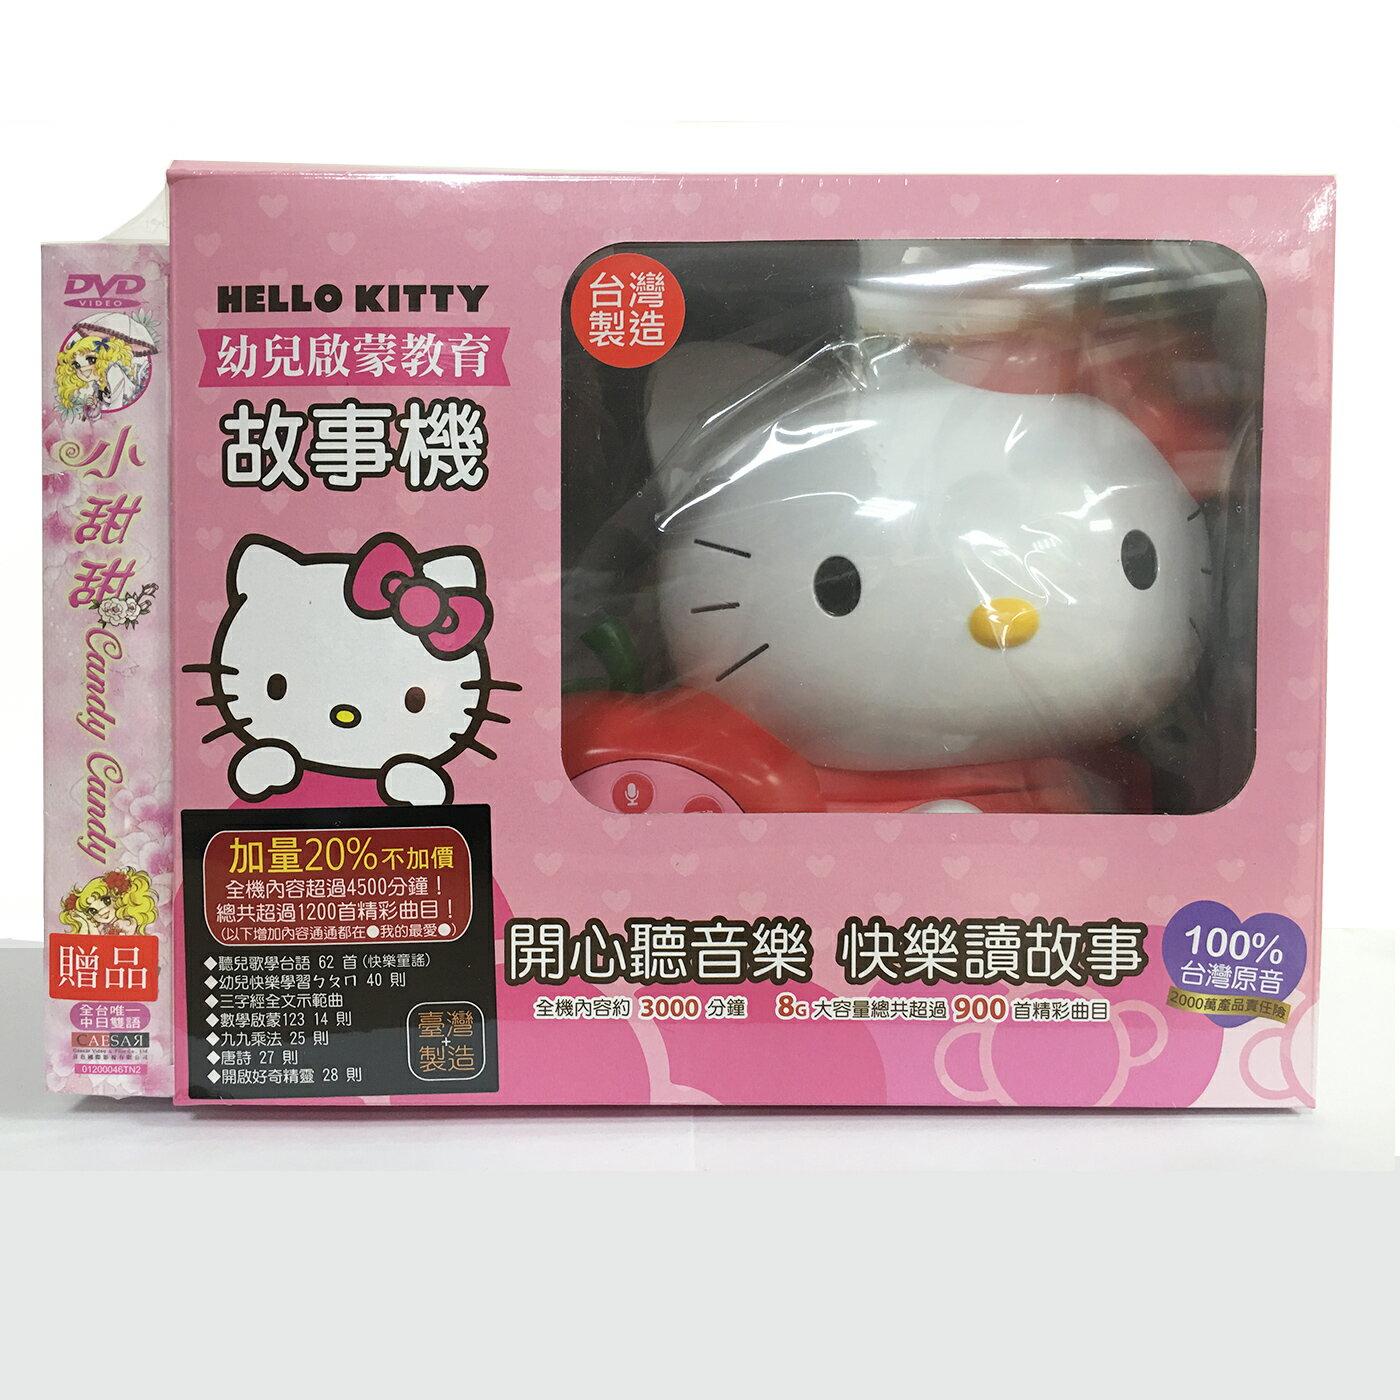 Hello Kitty幼兒啟蒙教育故事機 4